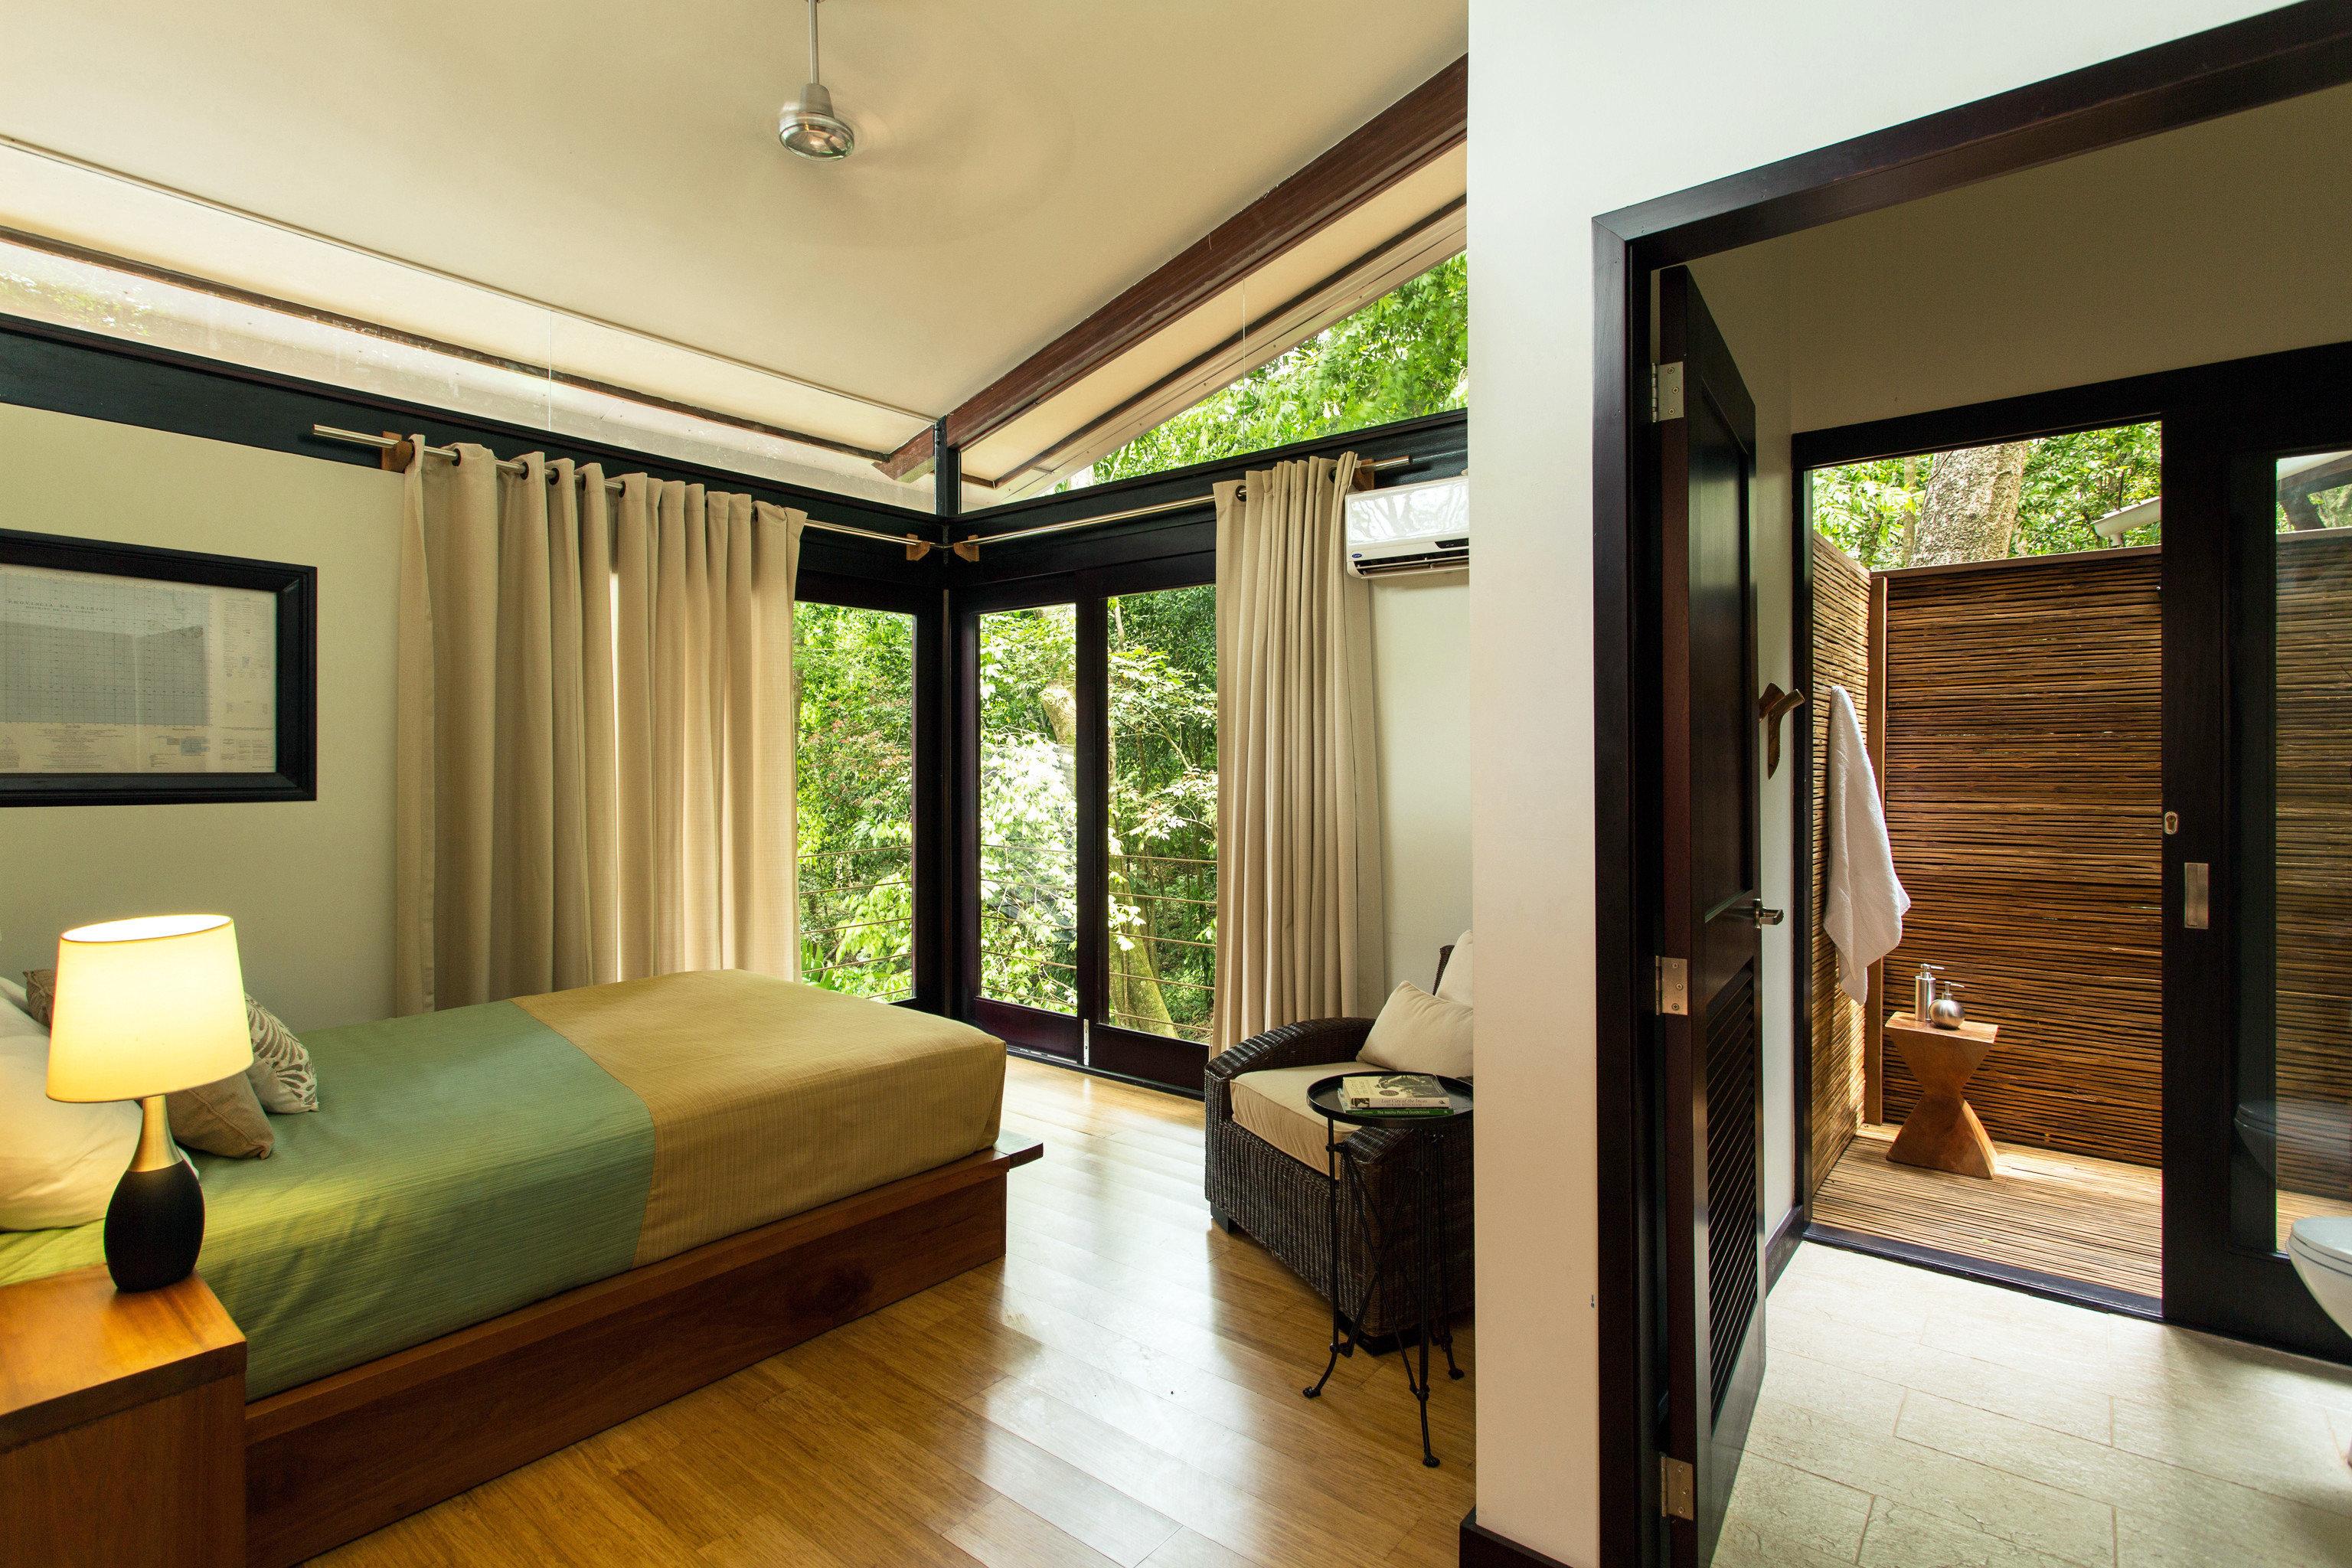 Bedroom Boutique Forest Jungle Luxury Modern Romantic Rustic property condominium Suite home Resort living room Villa